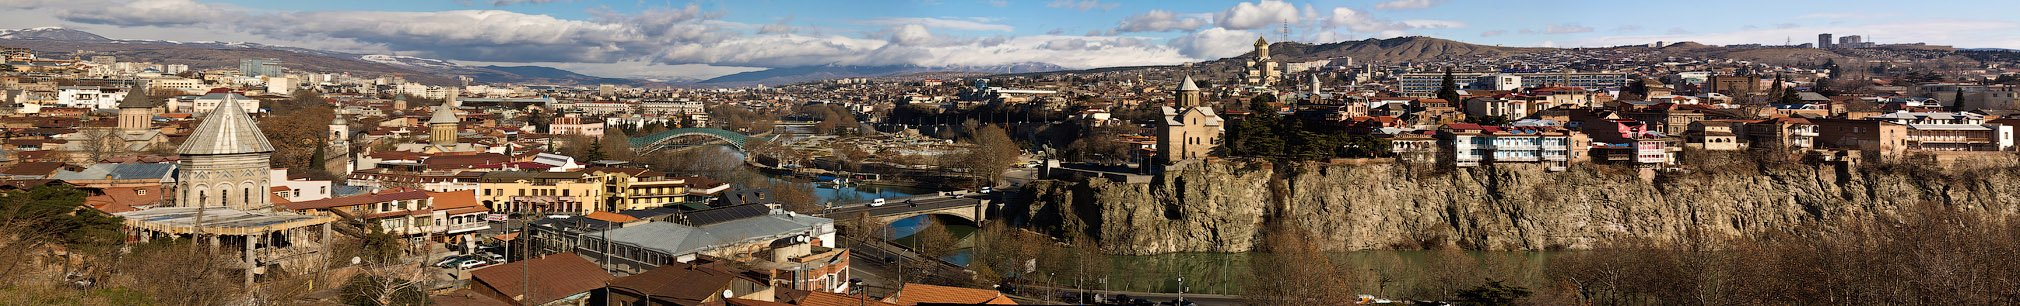 грузия, тбилиси, панорама, Артем Верхогляд